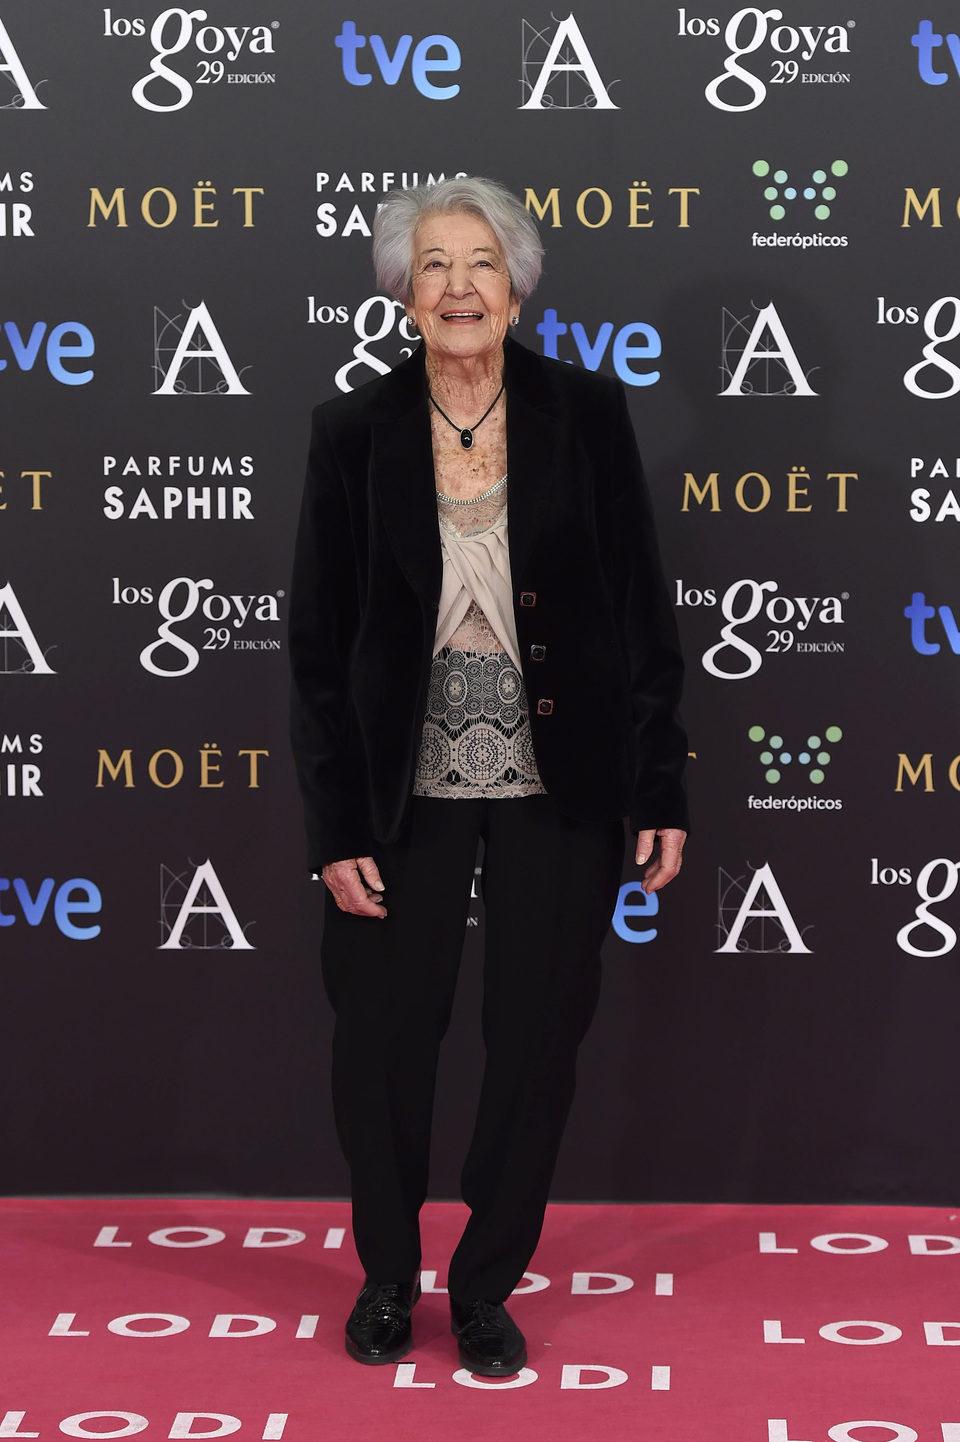 Asunción Balaguer en los premios Goya 2015